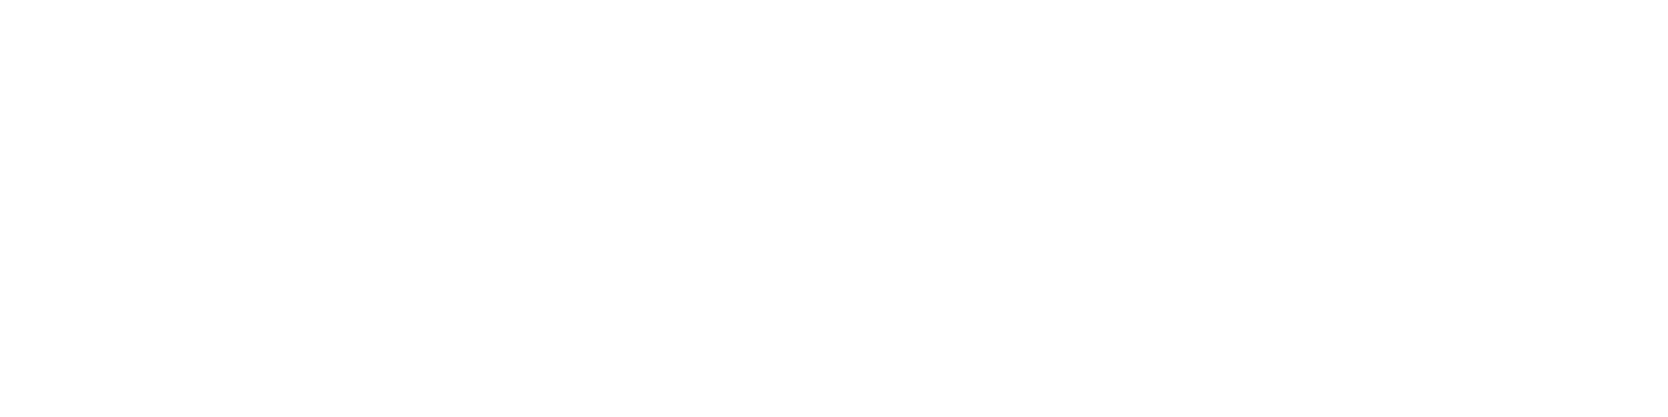 balaji-udyog-logo